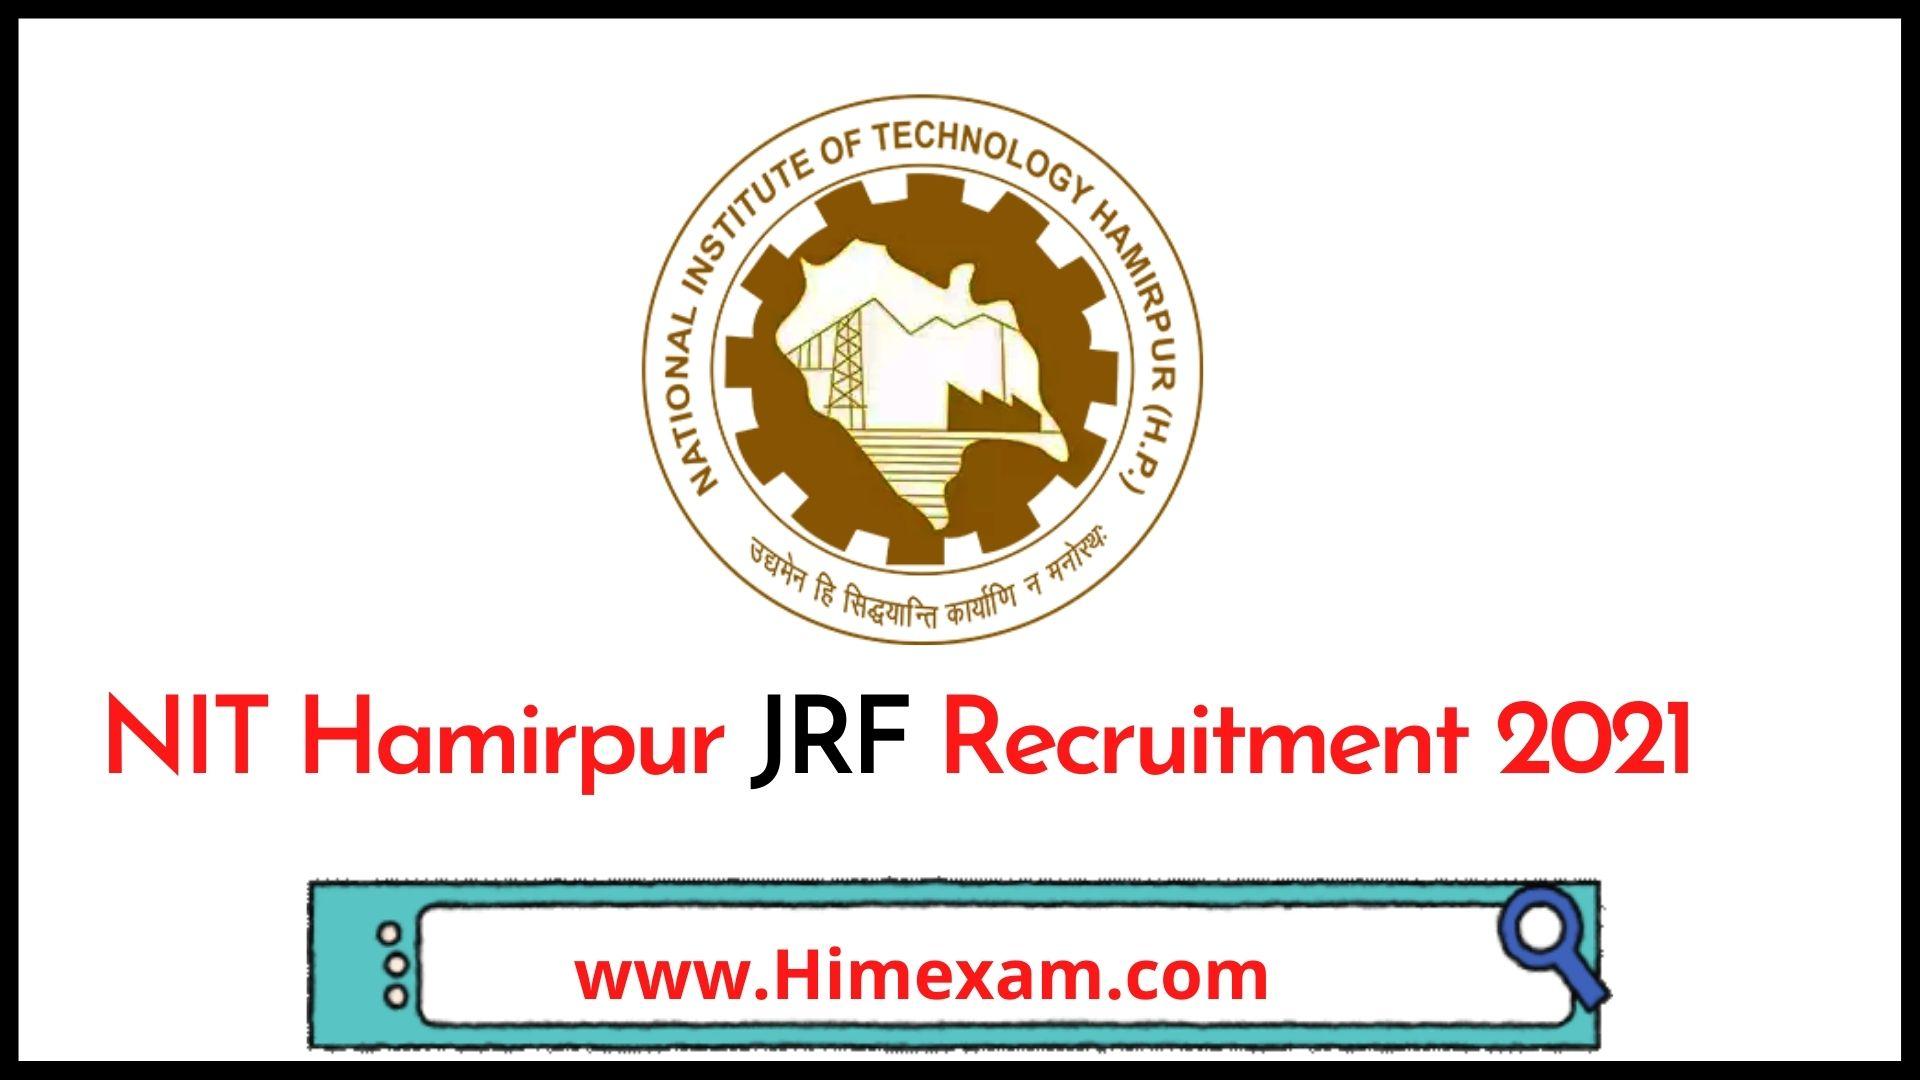 NIT Hamirpur JRF Recruitment 2021